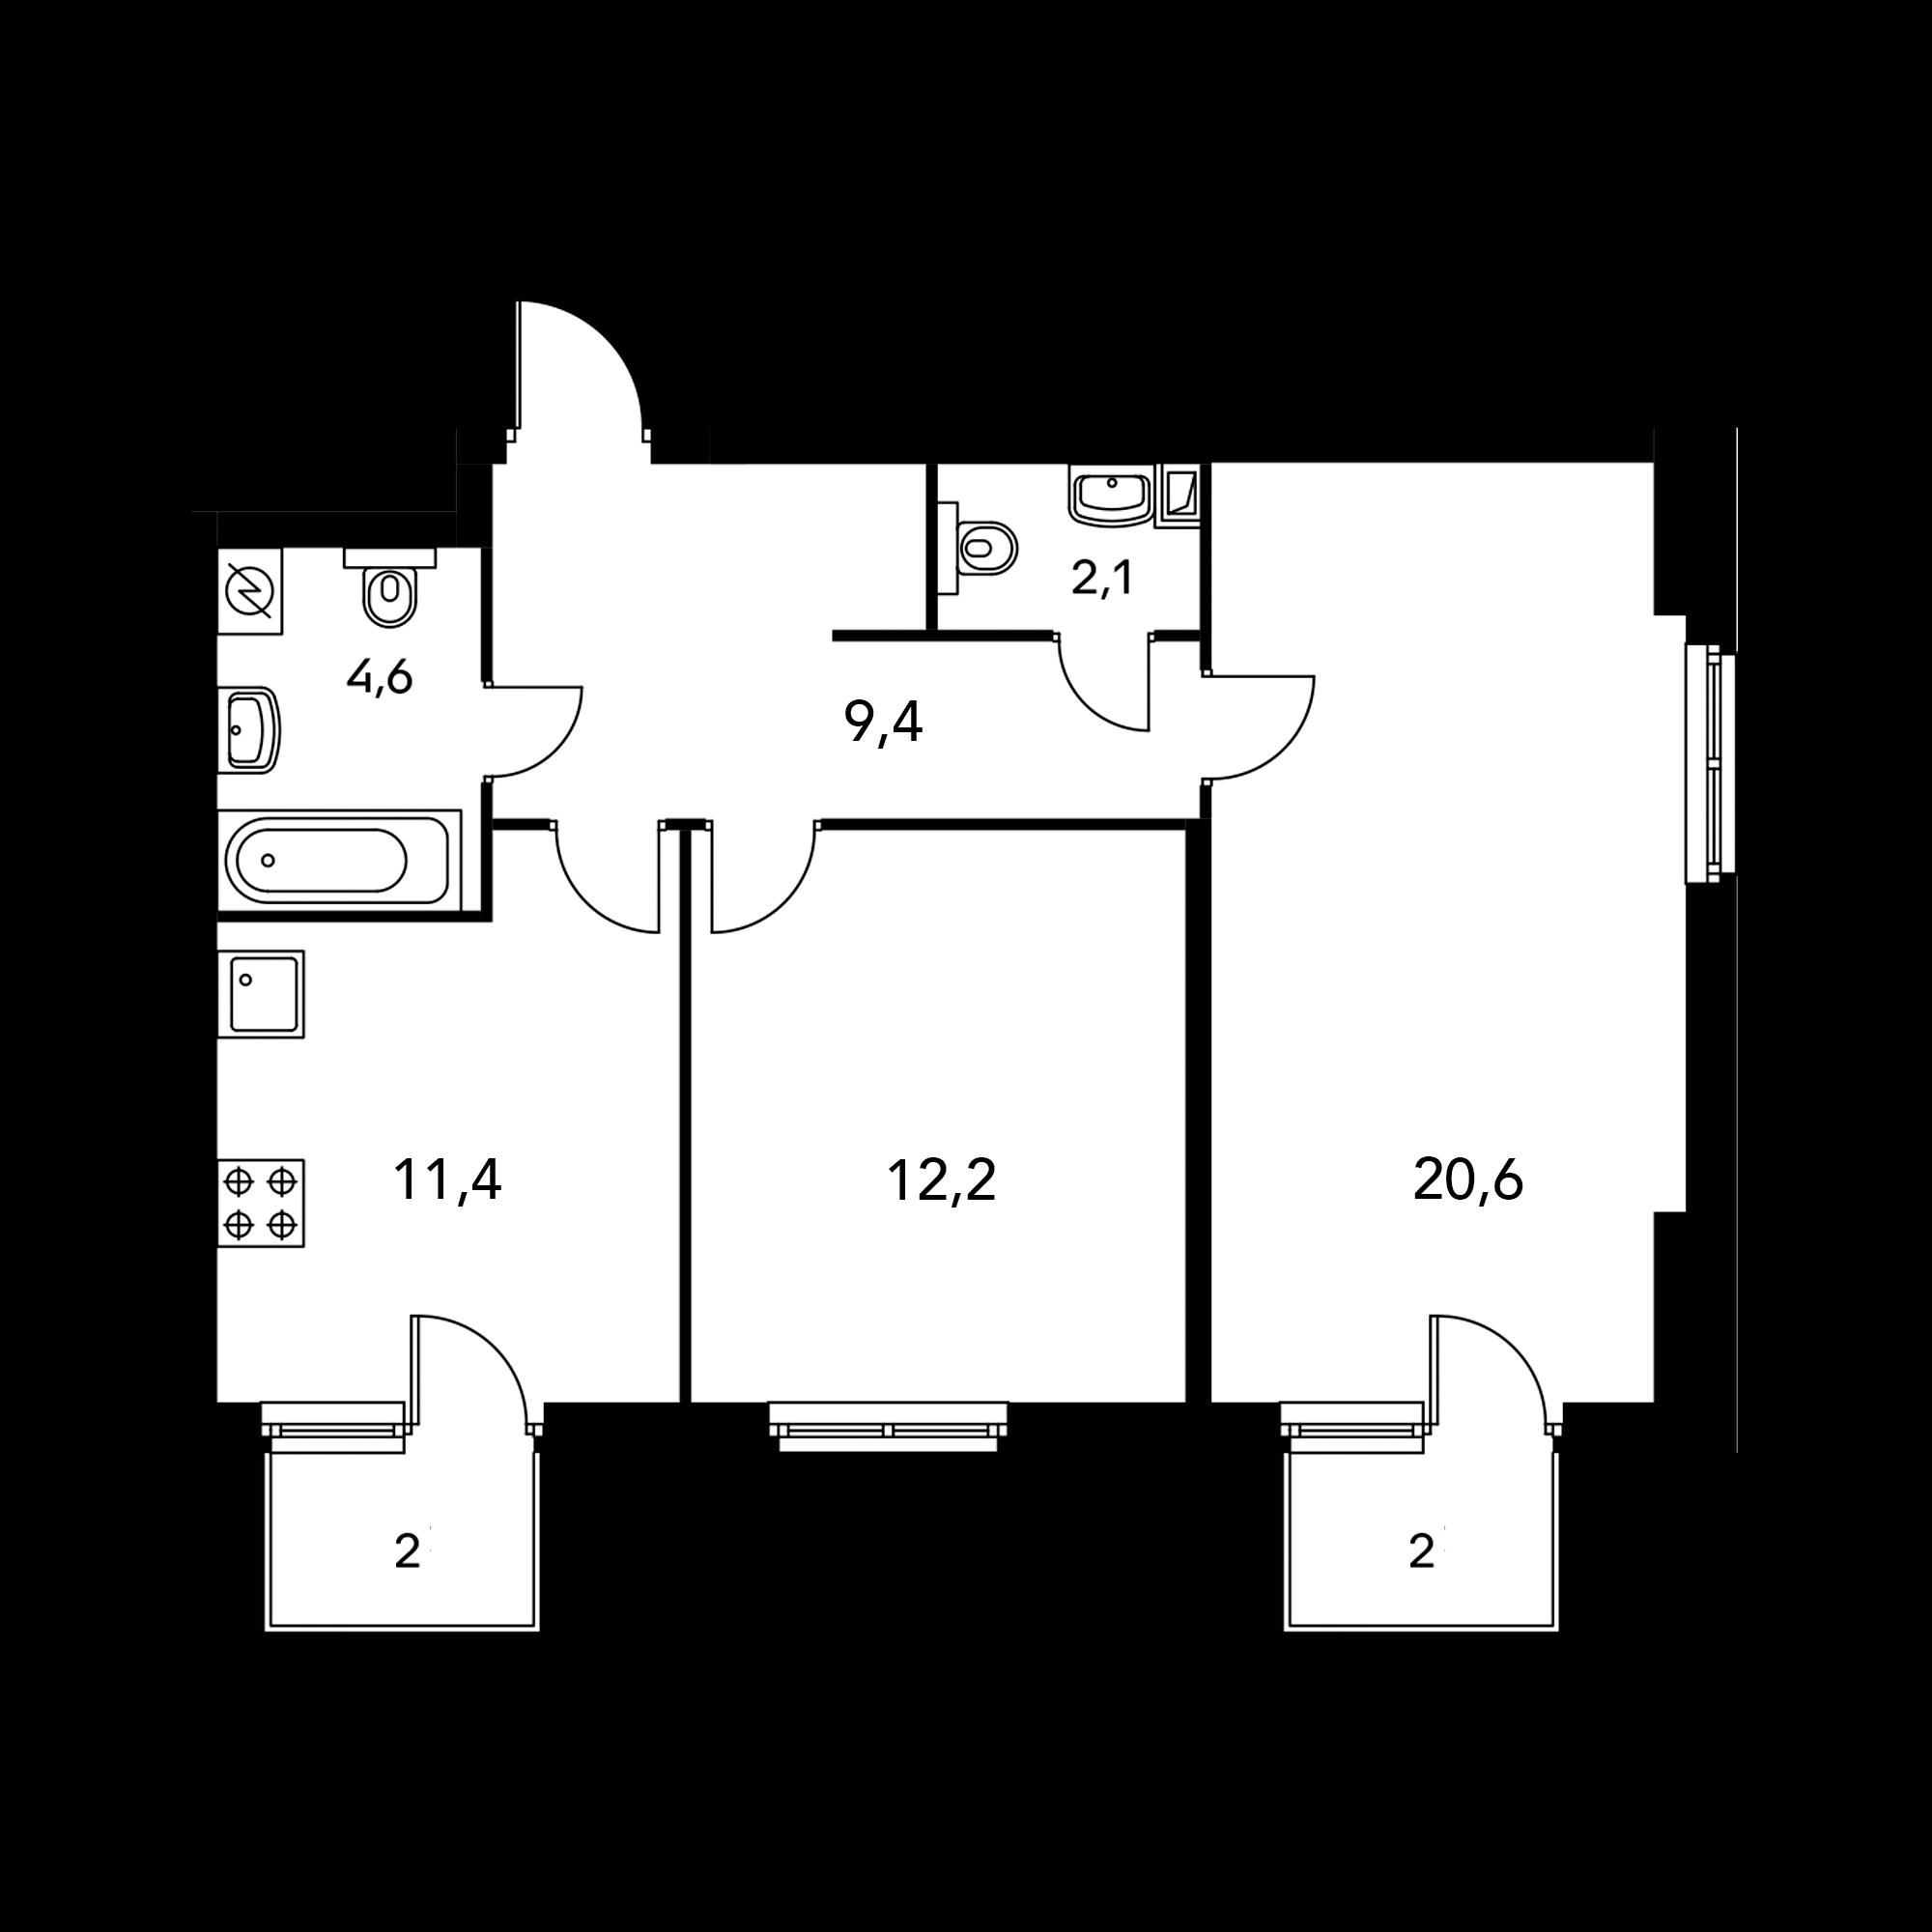 2KM6_10.2-ZB2